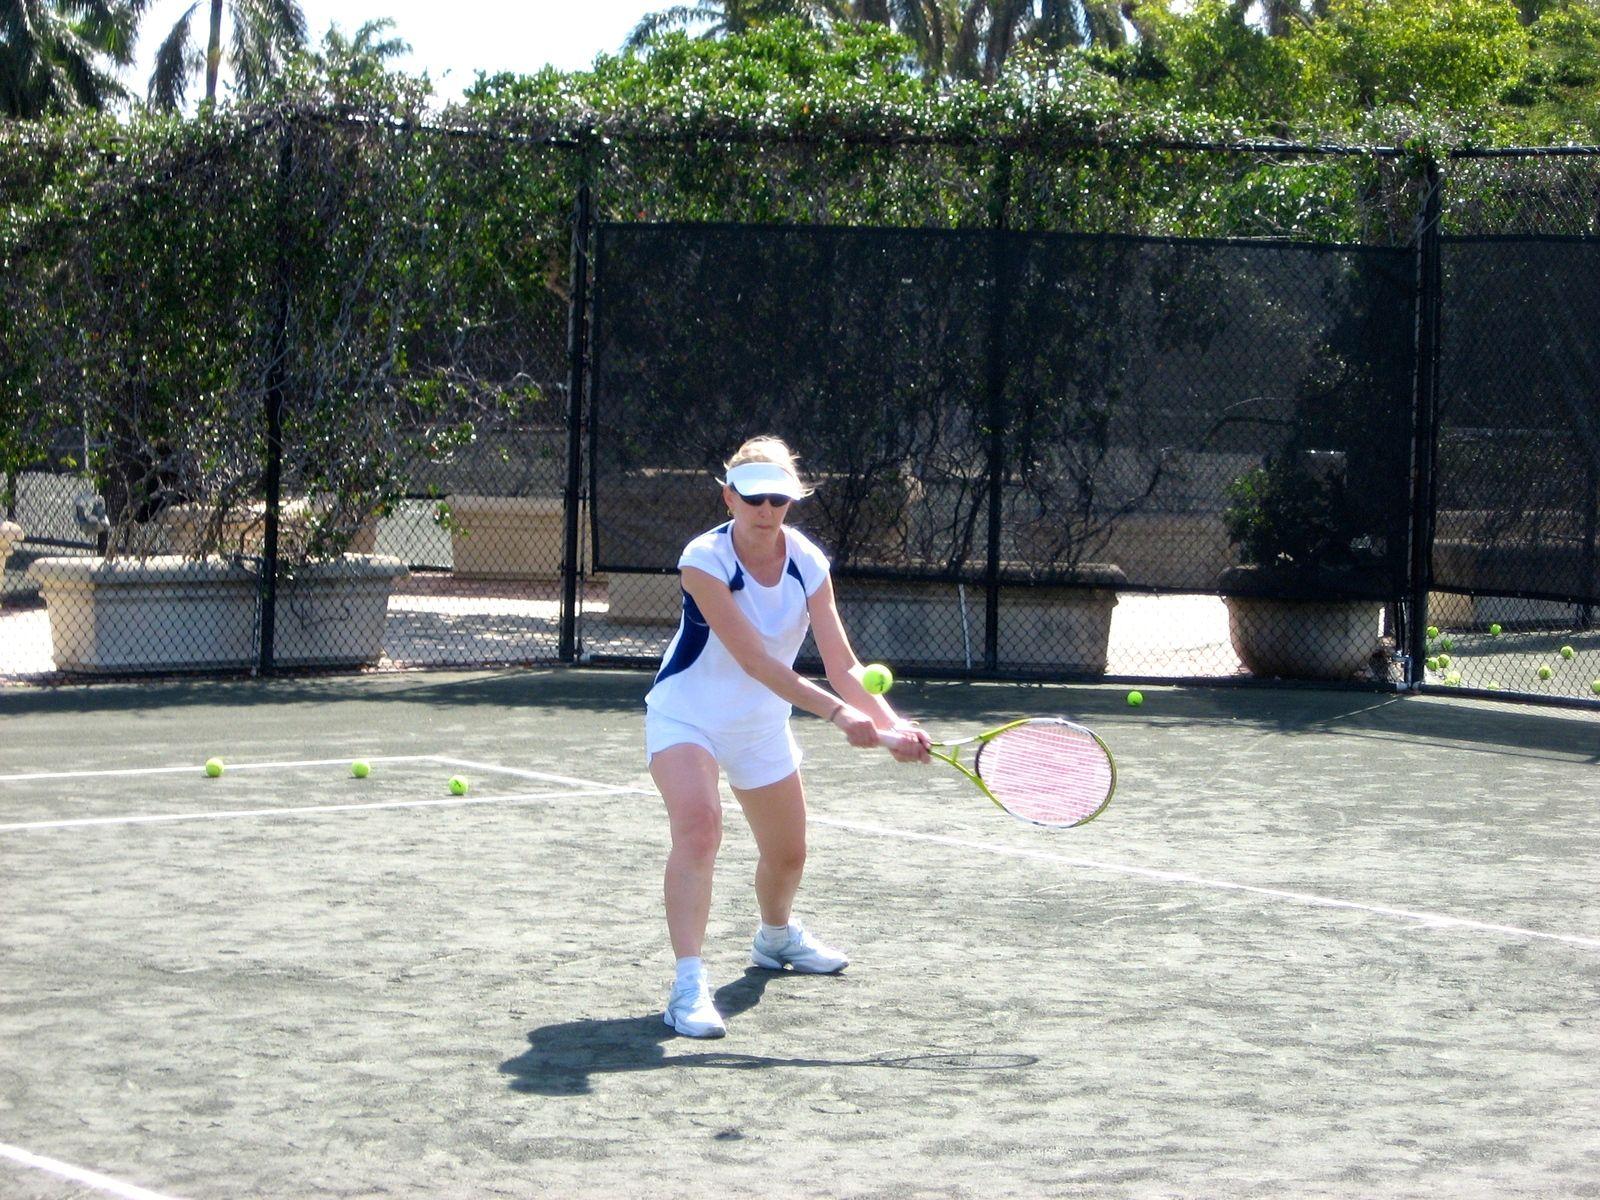 tennis-tourist-boca-raton-evert-tennis-academy-teri-church